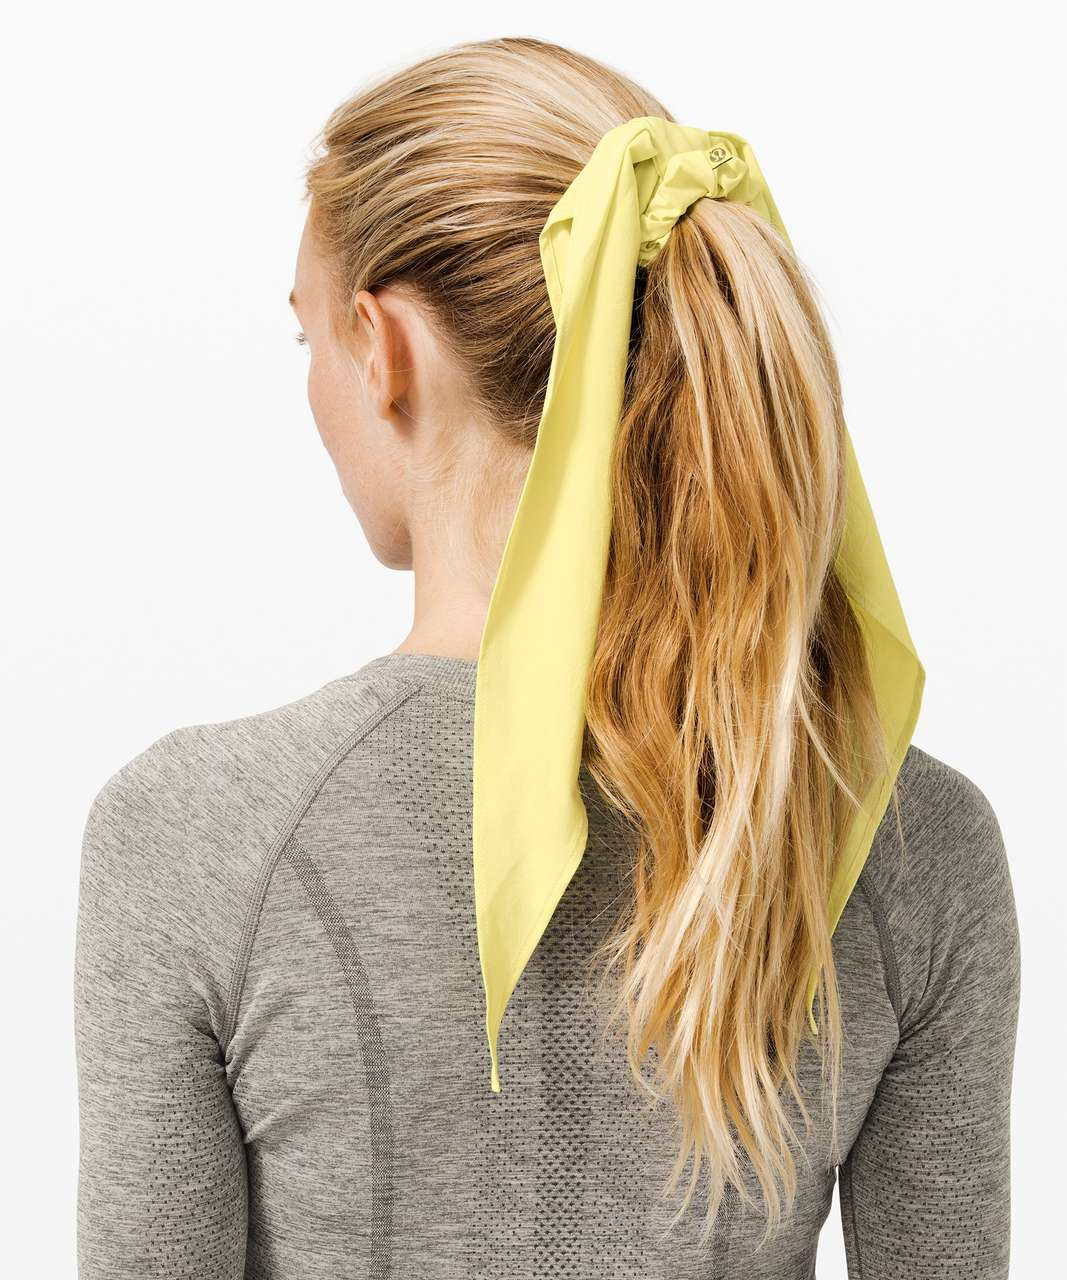 Lululemon Uplifting Scrunchie *Flow - Lemon Vibe